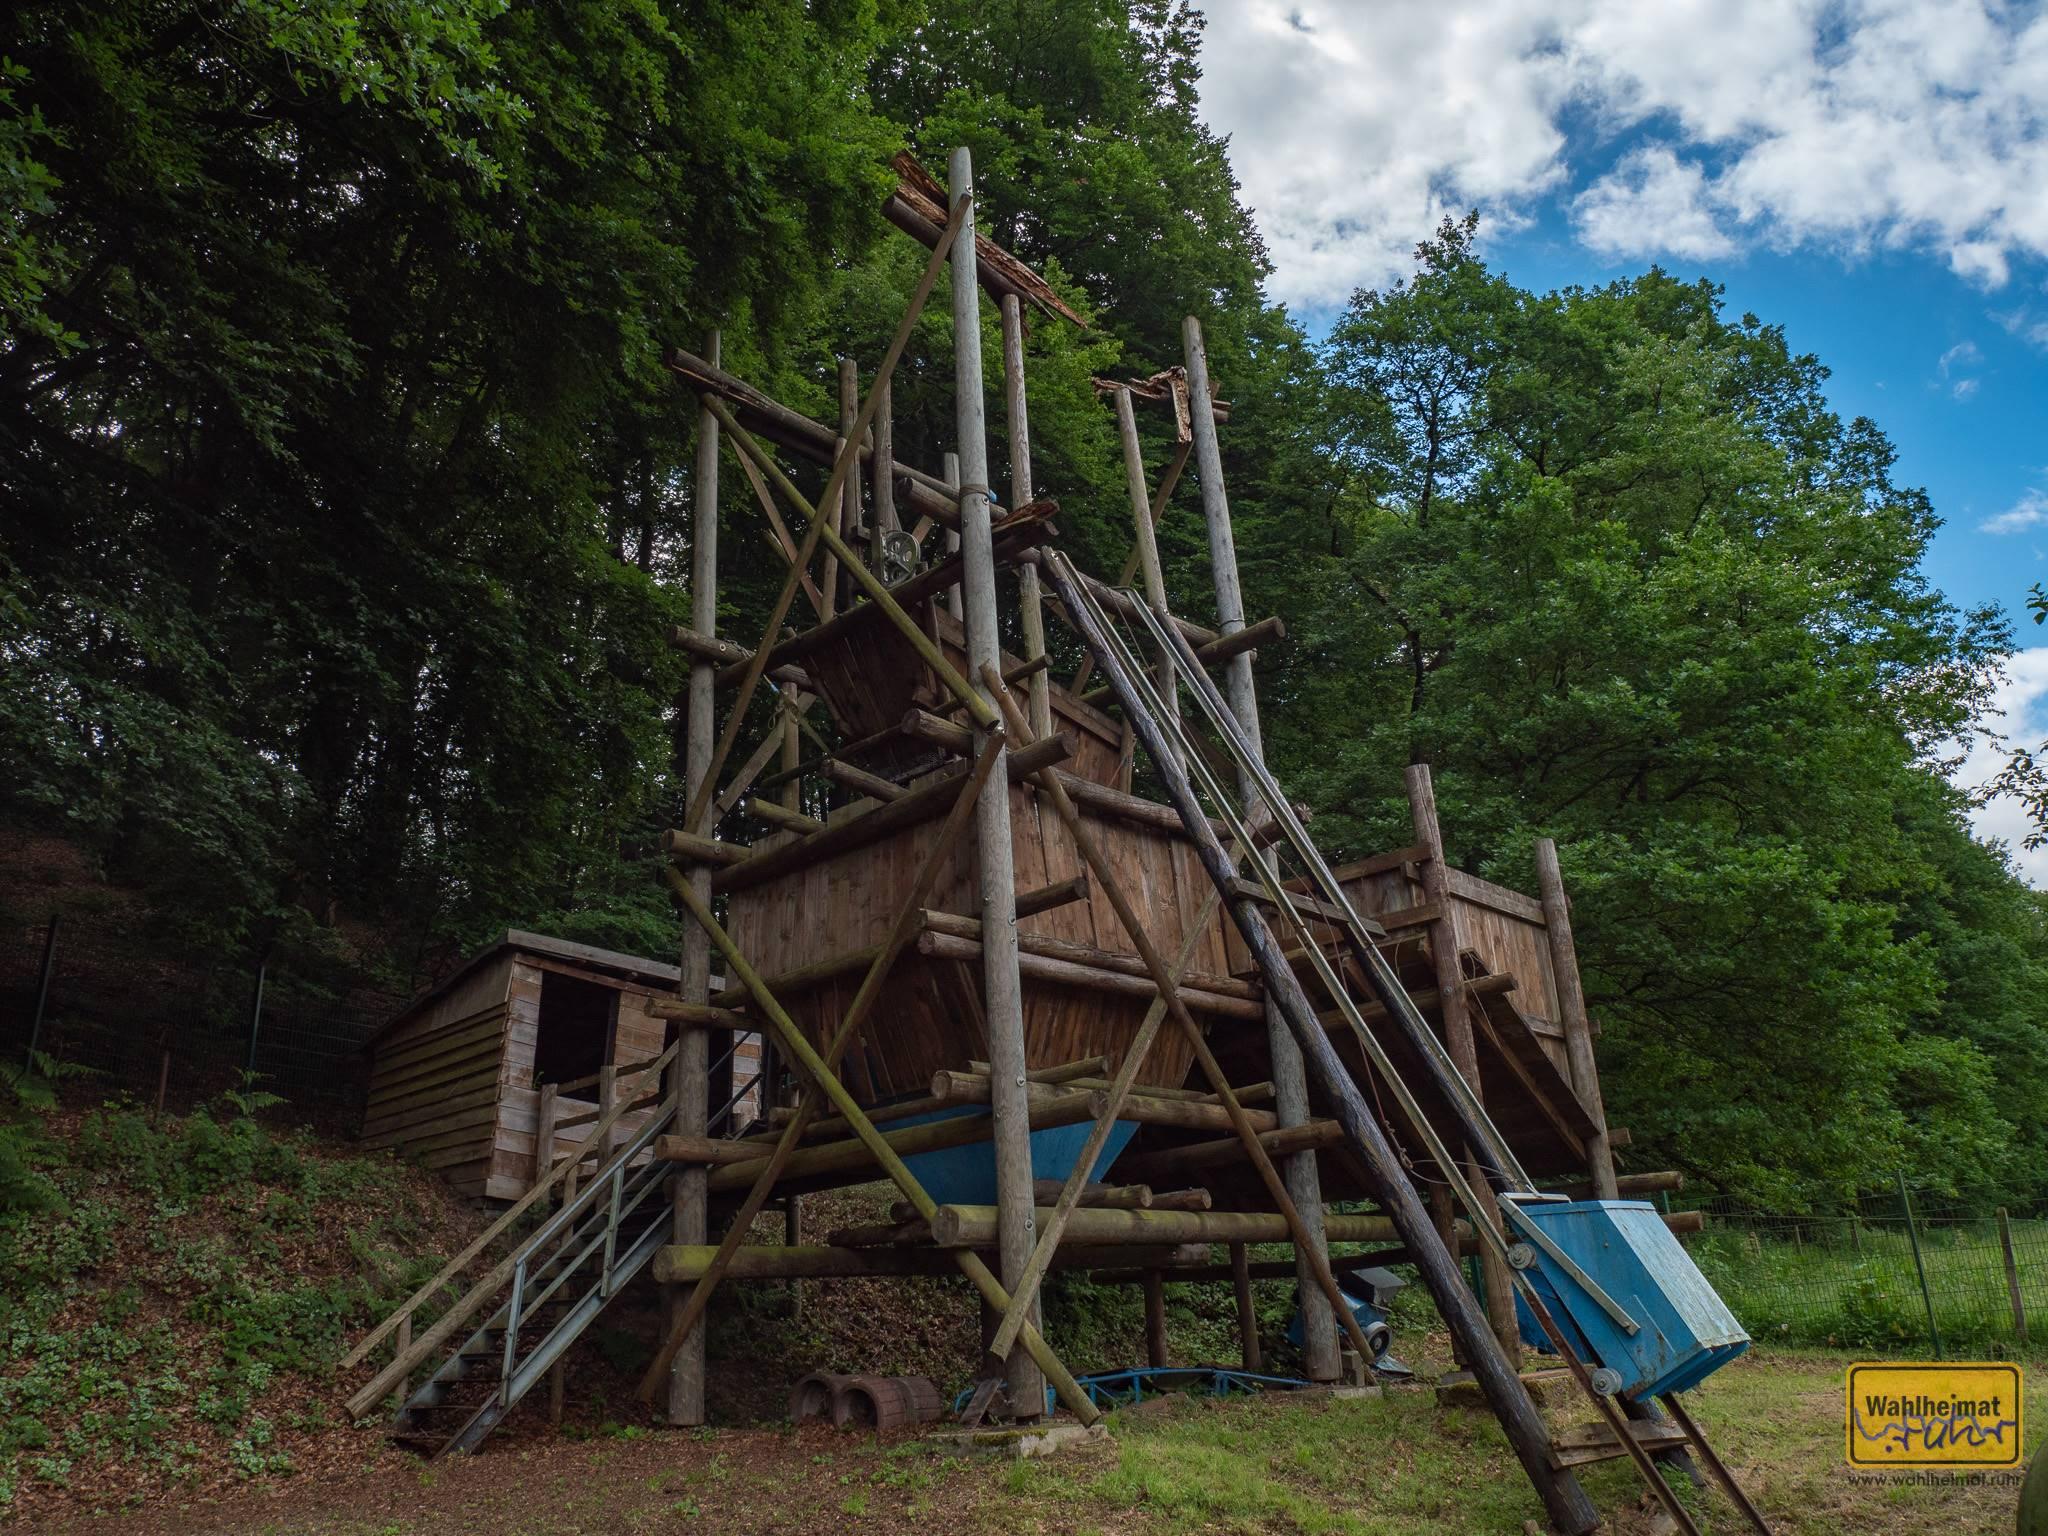 Baumaterial war hauptsächlich Holz.